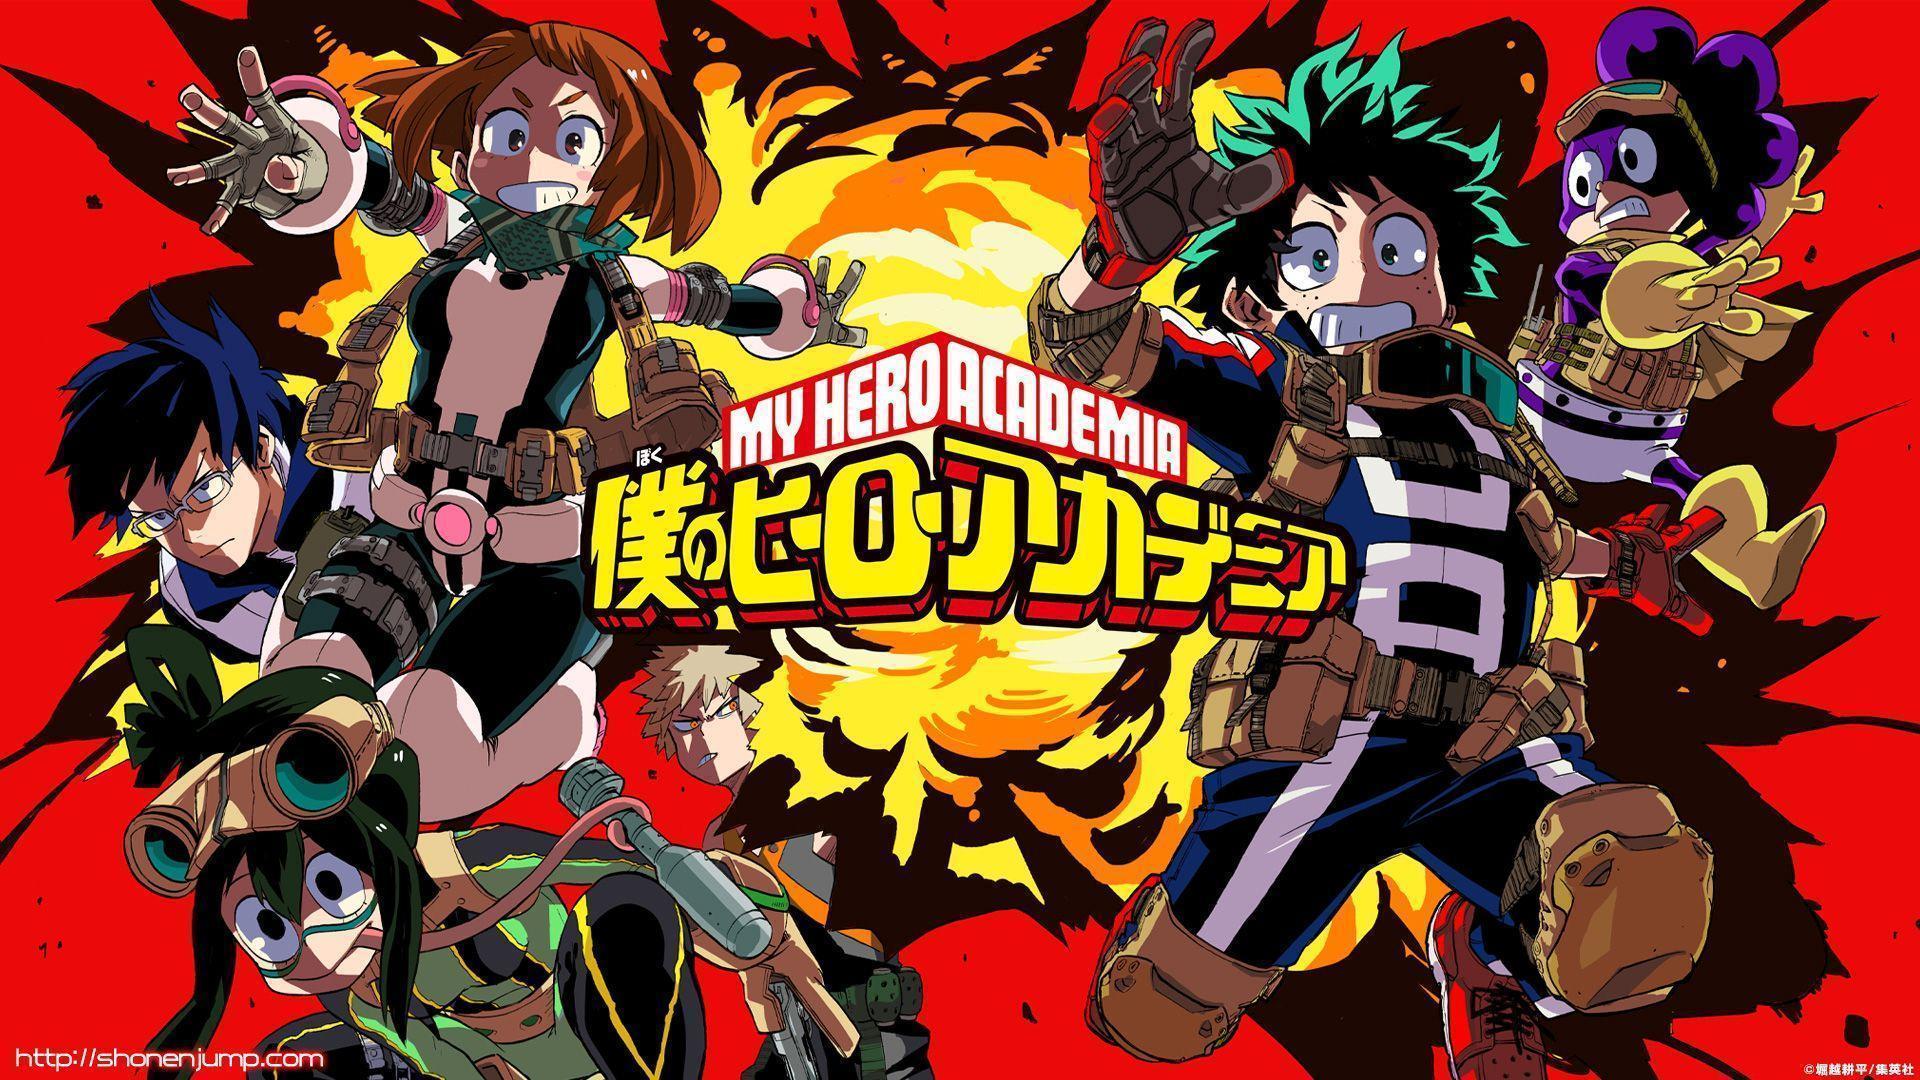 Deku my hero academia 4k wallpapers top deku my hero 3840x2160. My Hero Academia Deku Wallpapers - Top Free My Hero ...